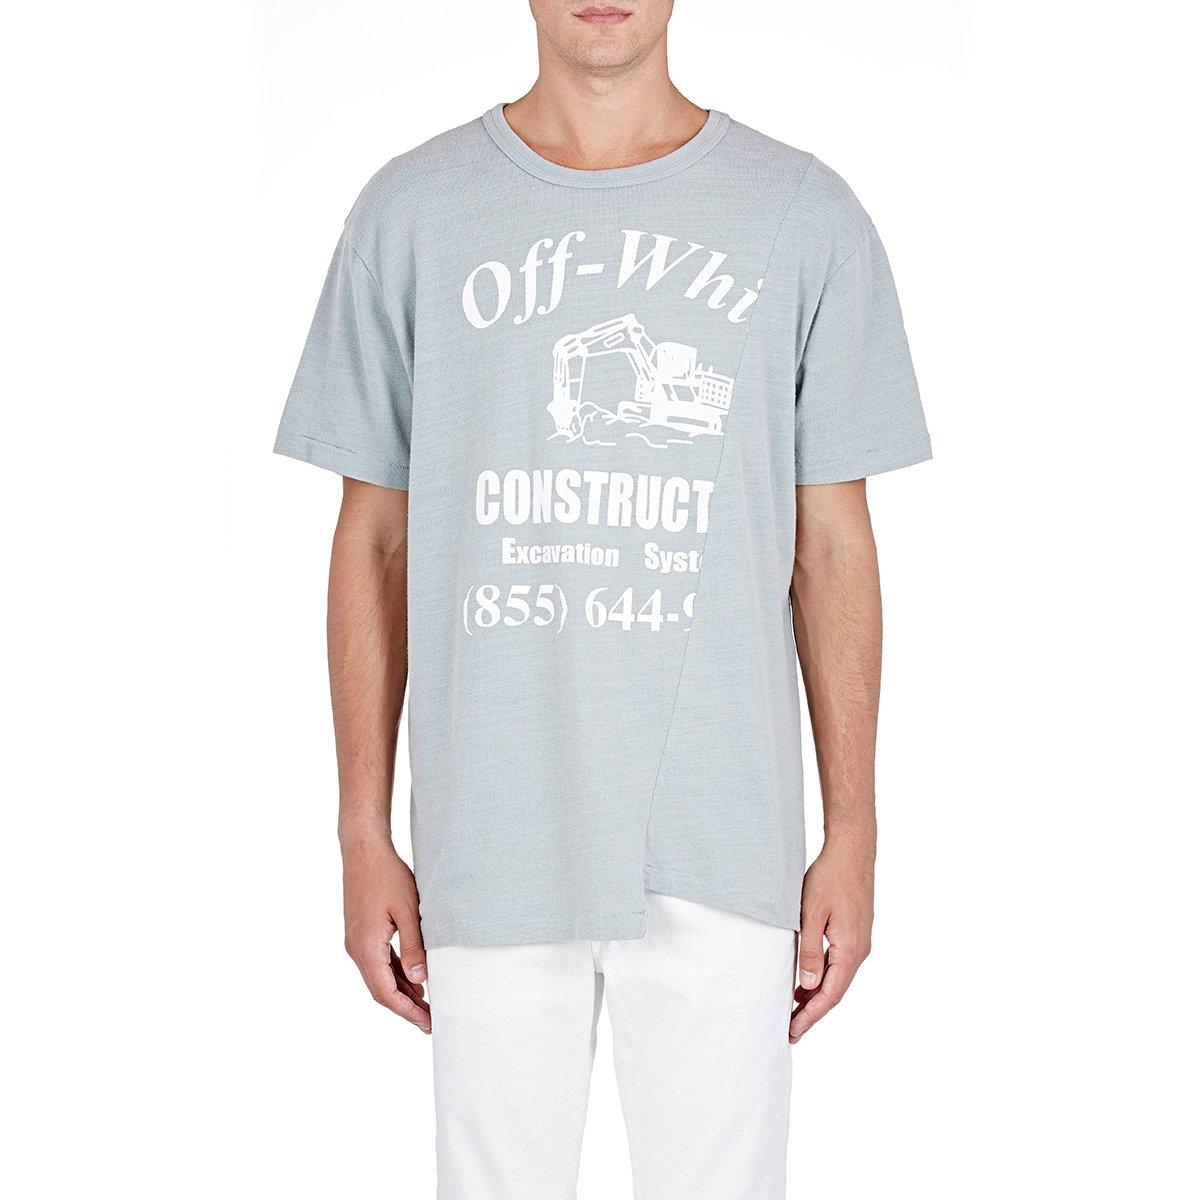 Lyst - Off-White c o Virgil Abloh Men s Construction T-shirt in Blue ... 00df4f82e826